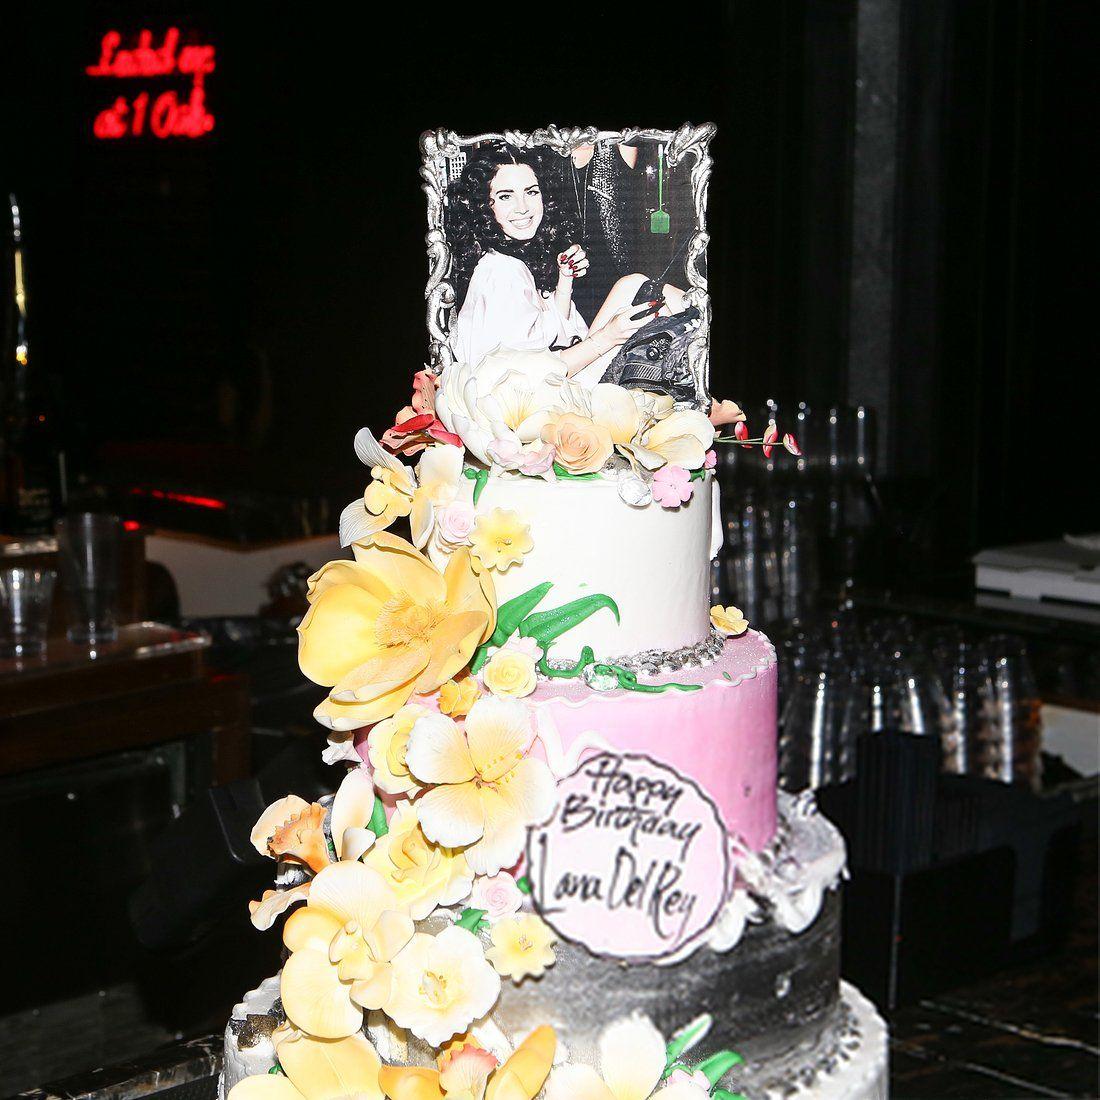 Lanas Birthday Cake Quincenera Stuff Pinterest Birthday Cakes